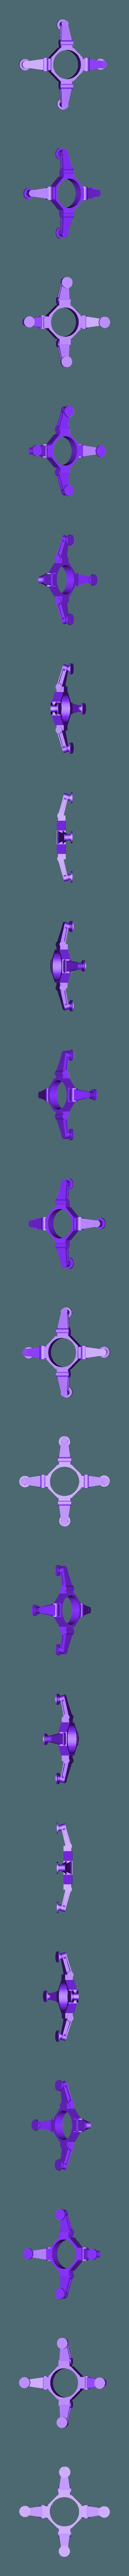 Turantula_complete.stl Download free STL file Automated Weapon Platform Mod kit (Tarantula) • Model to 3D print, JtStrait72